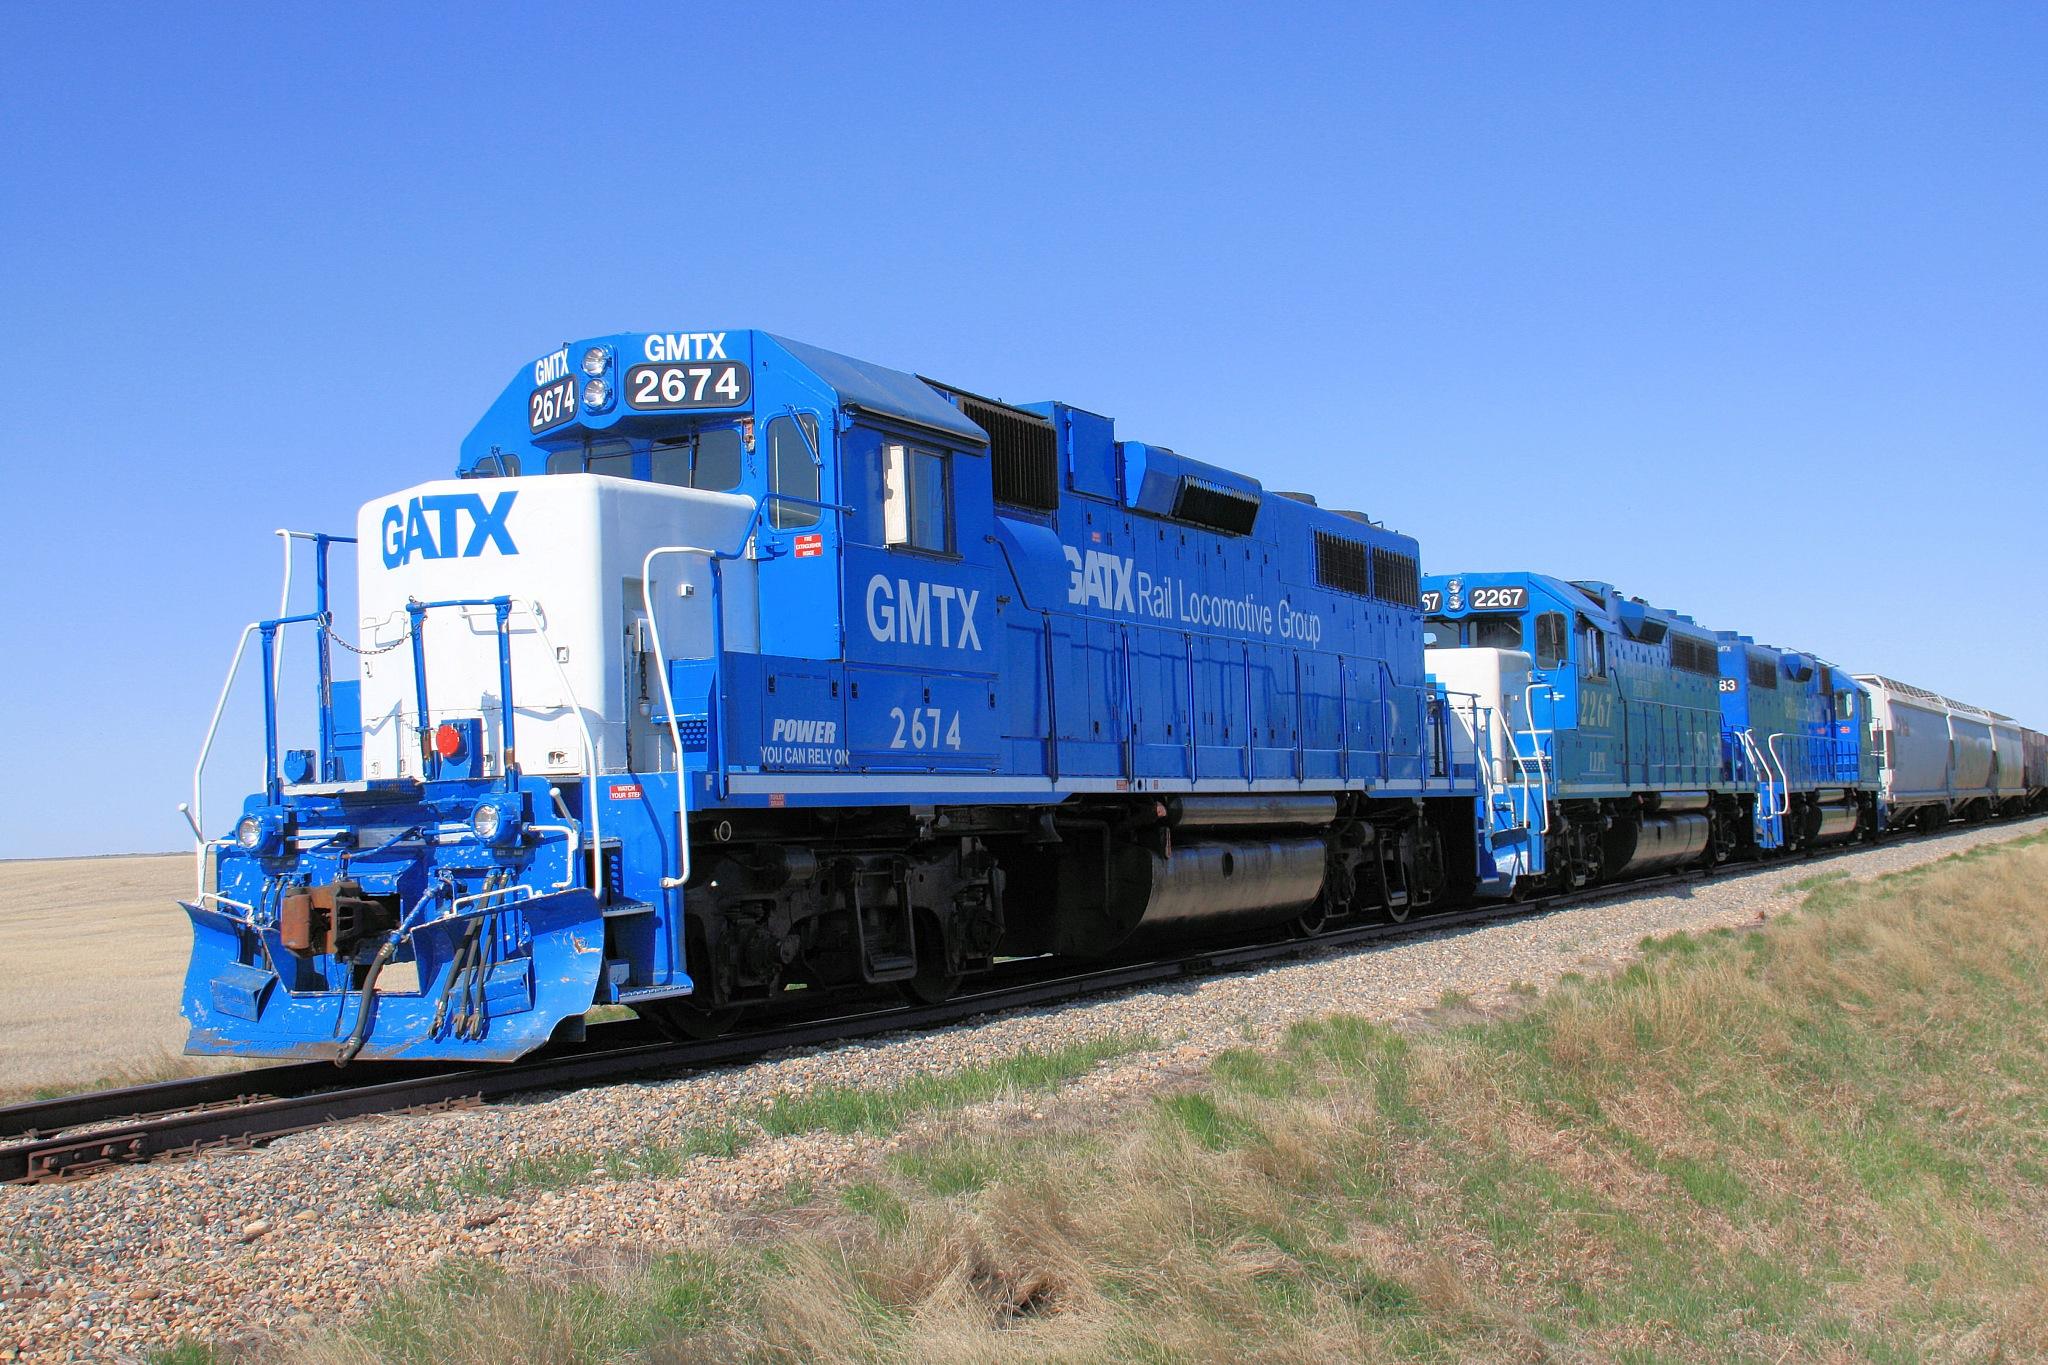 GATX Rail Locomotive Group by Dan Loran